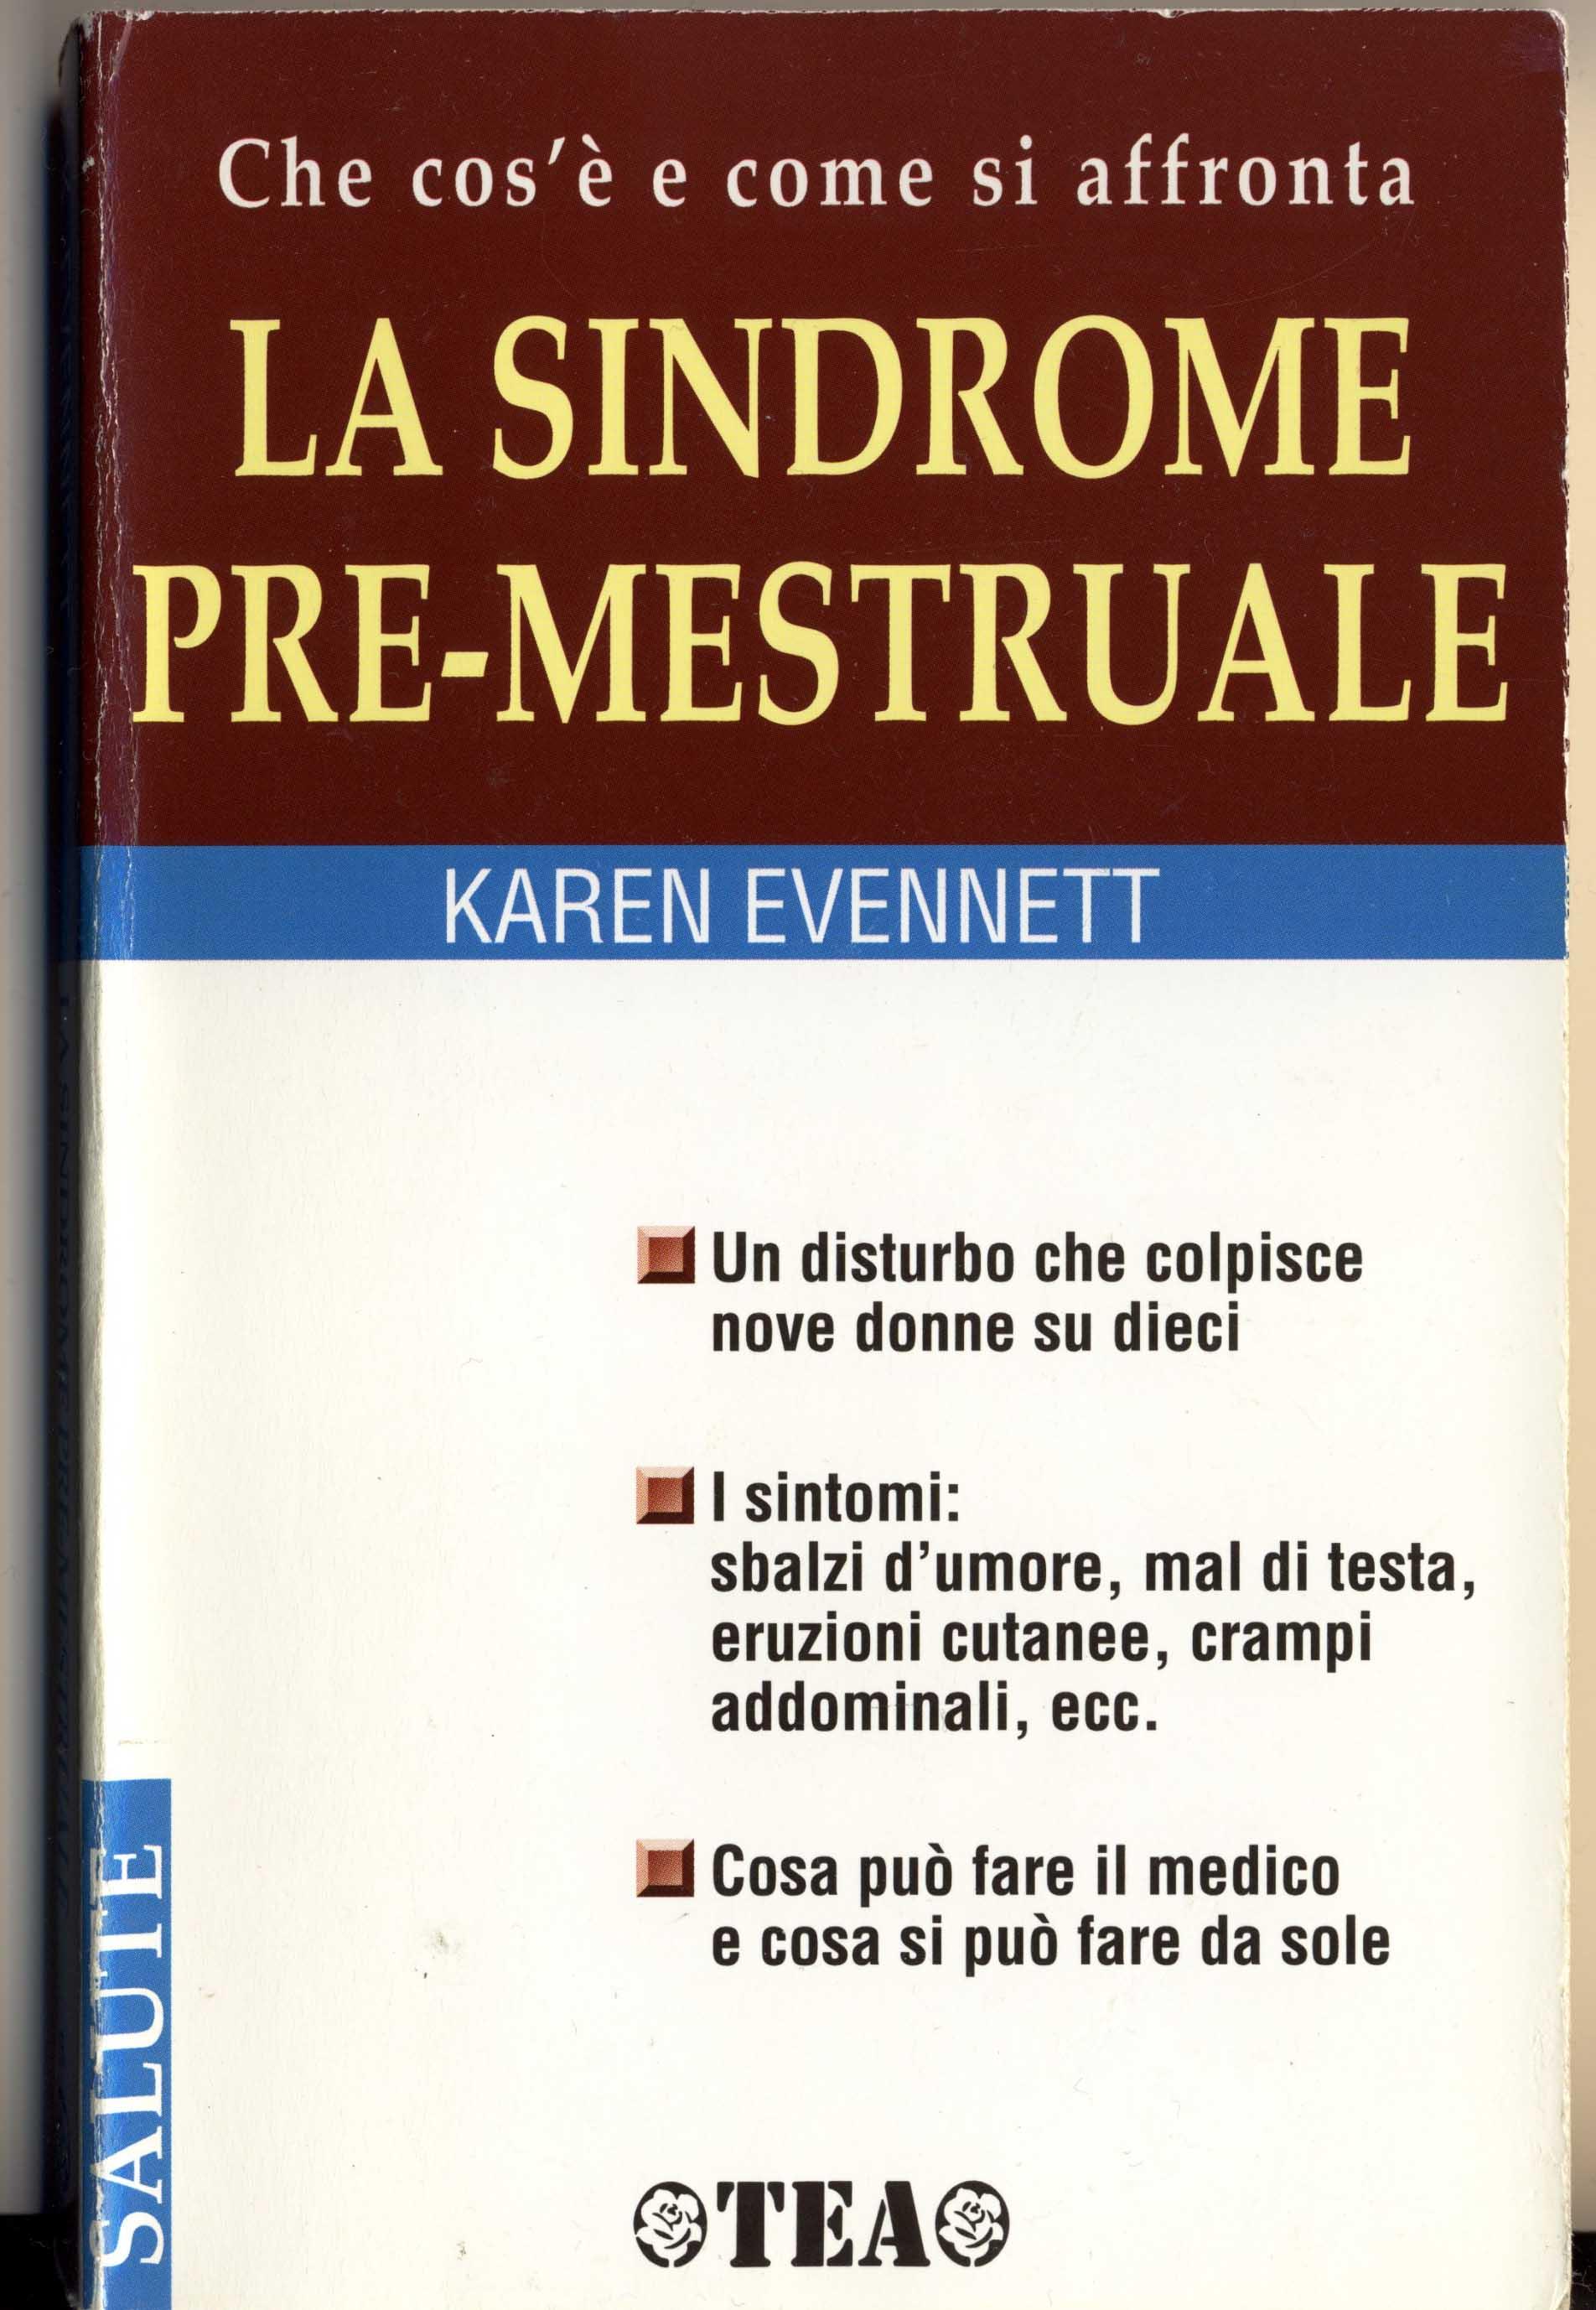 La sindrome pre-mestruale